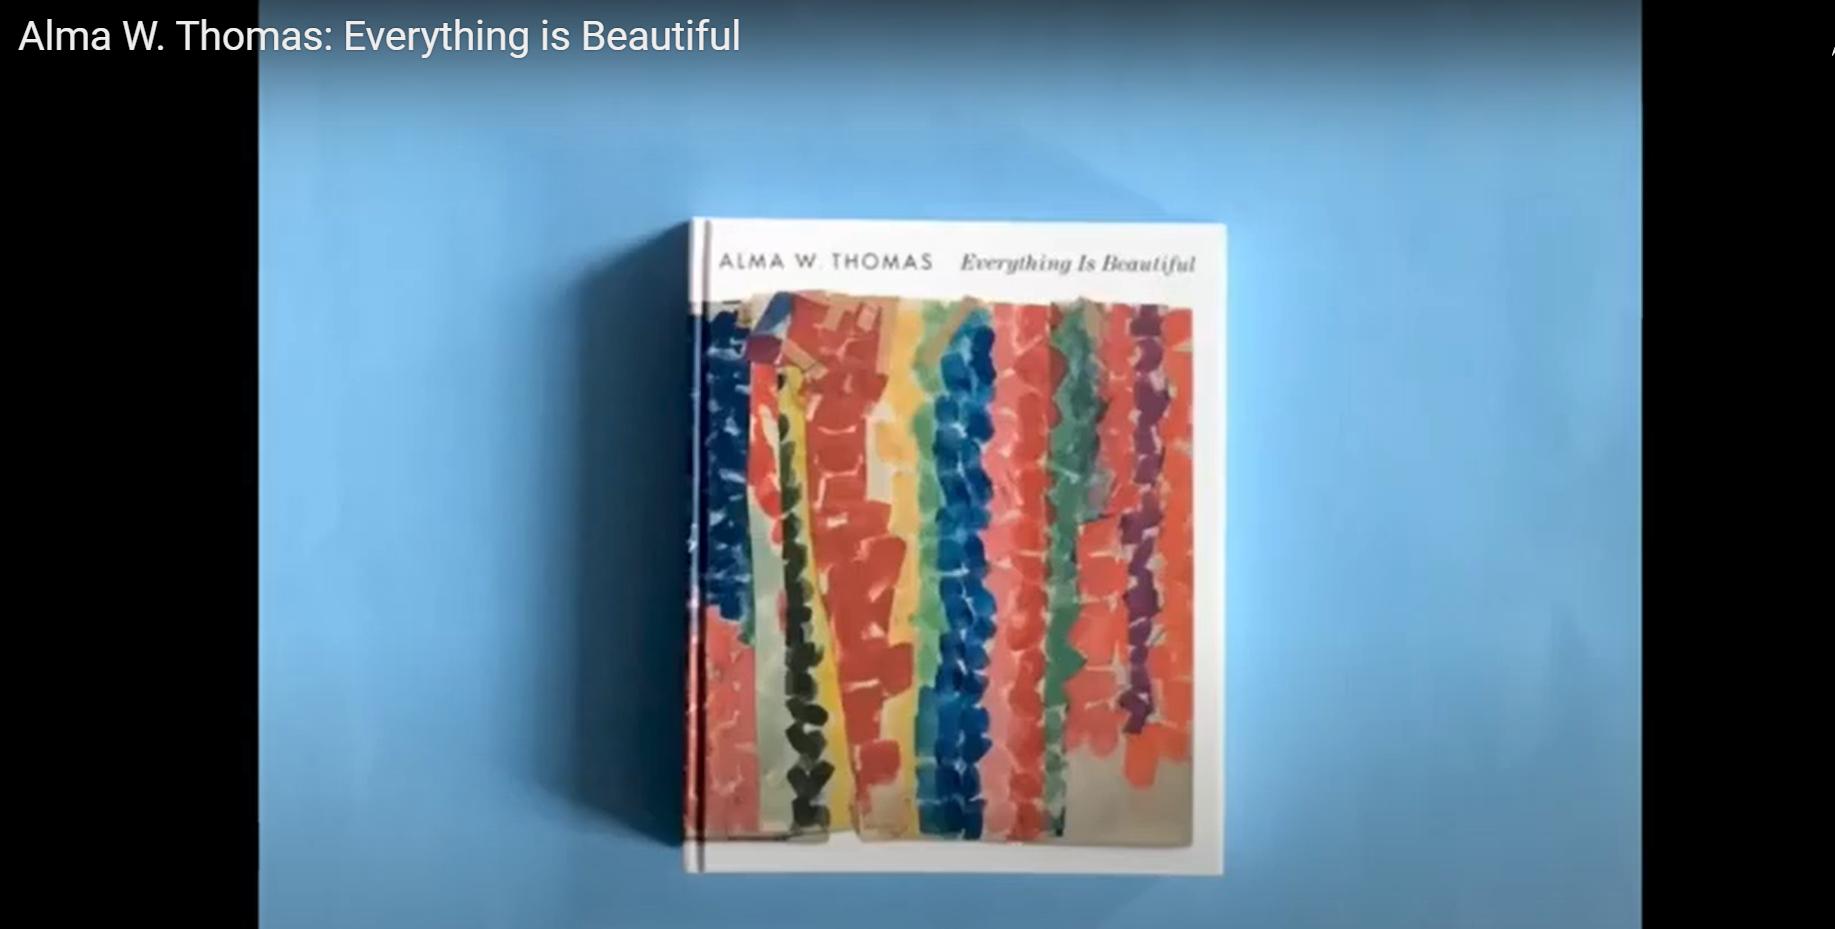 Alma W. Thomas: Everything Is Beautiful